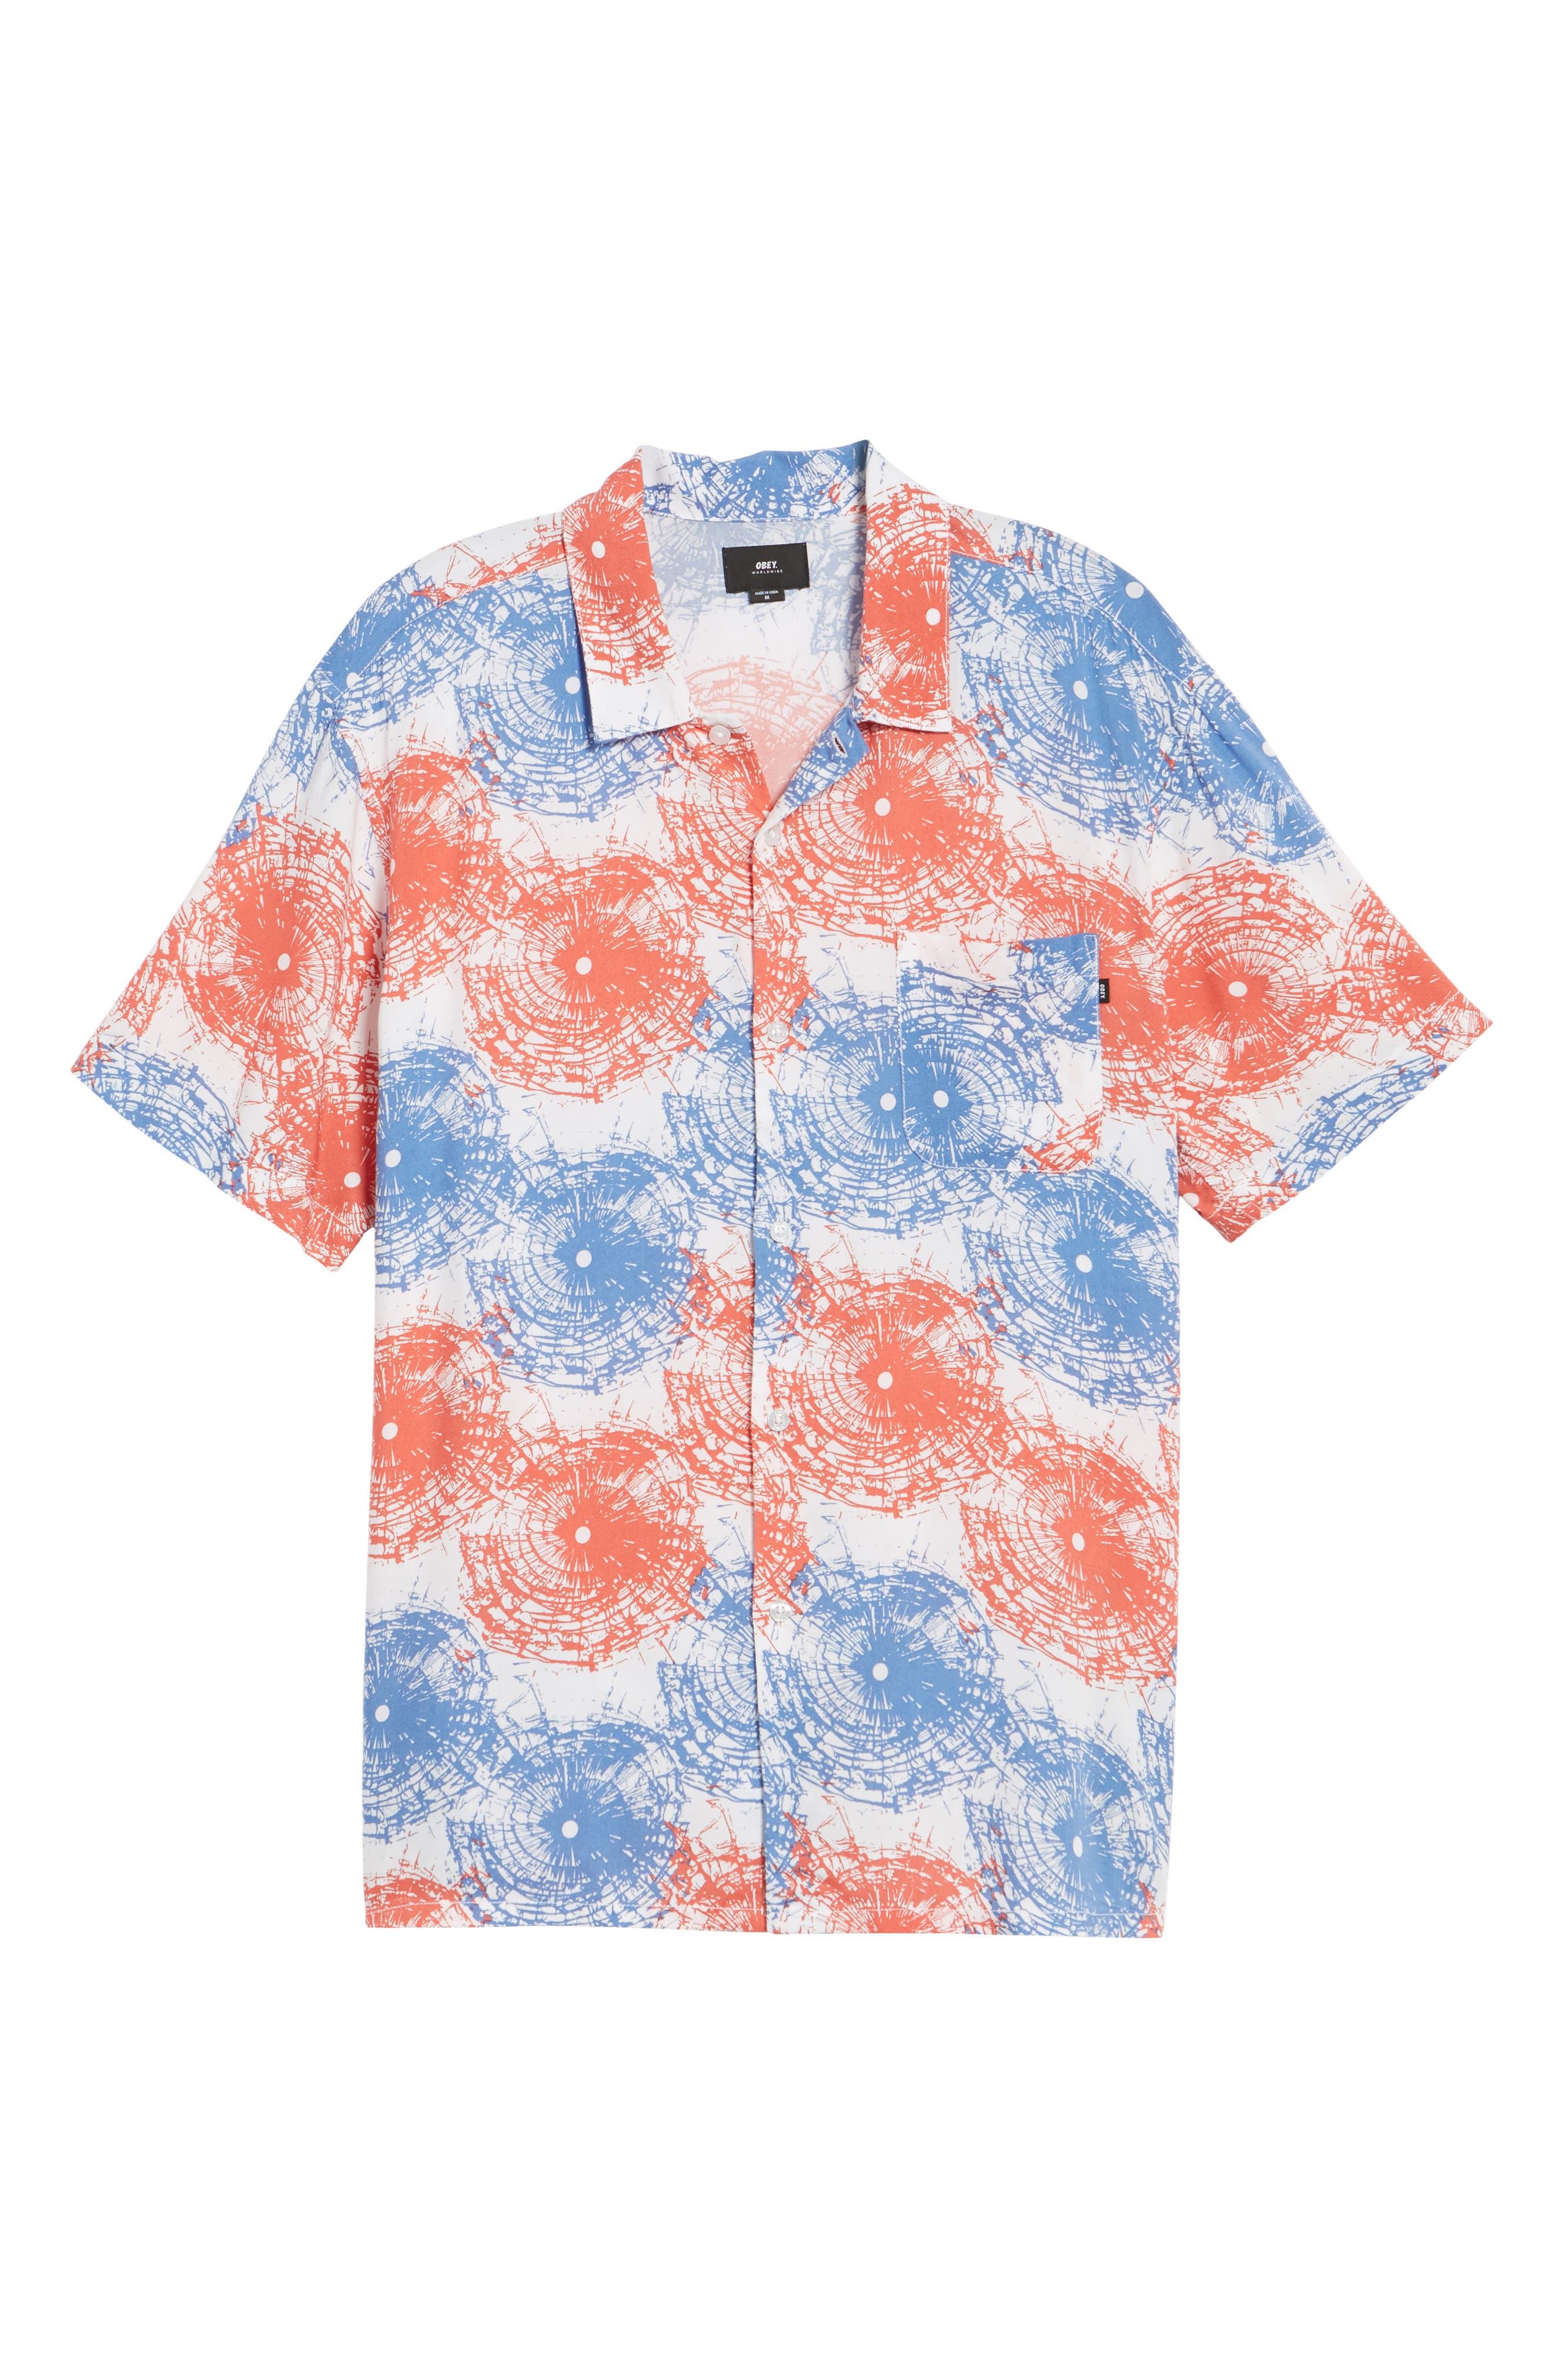 Shattered Woven Shirt,                             Alternate thumbnail 6, color,                             Red Multi